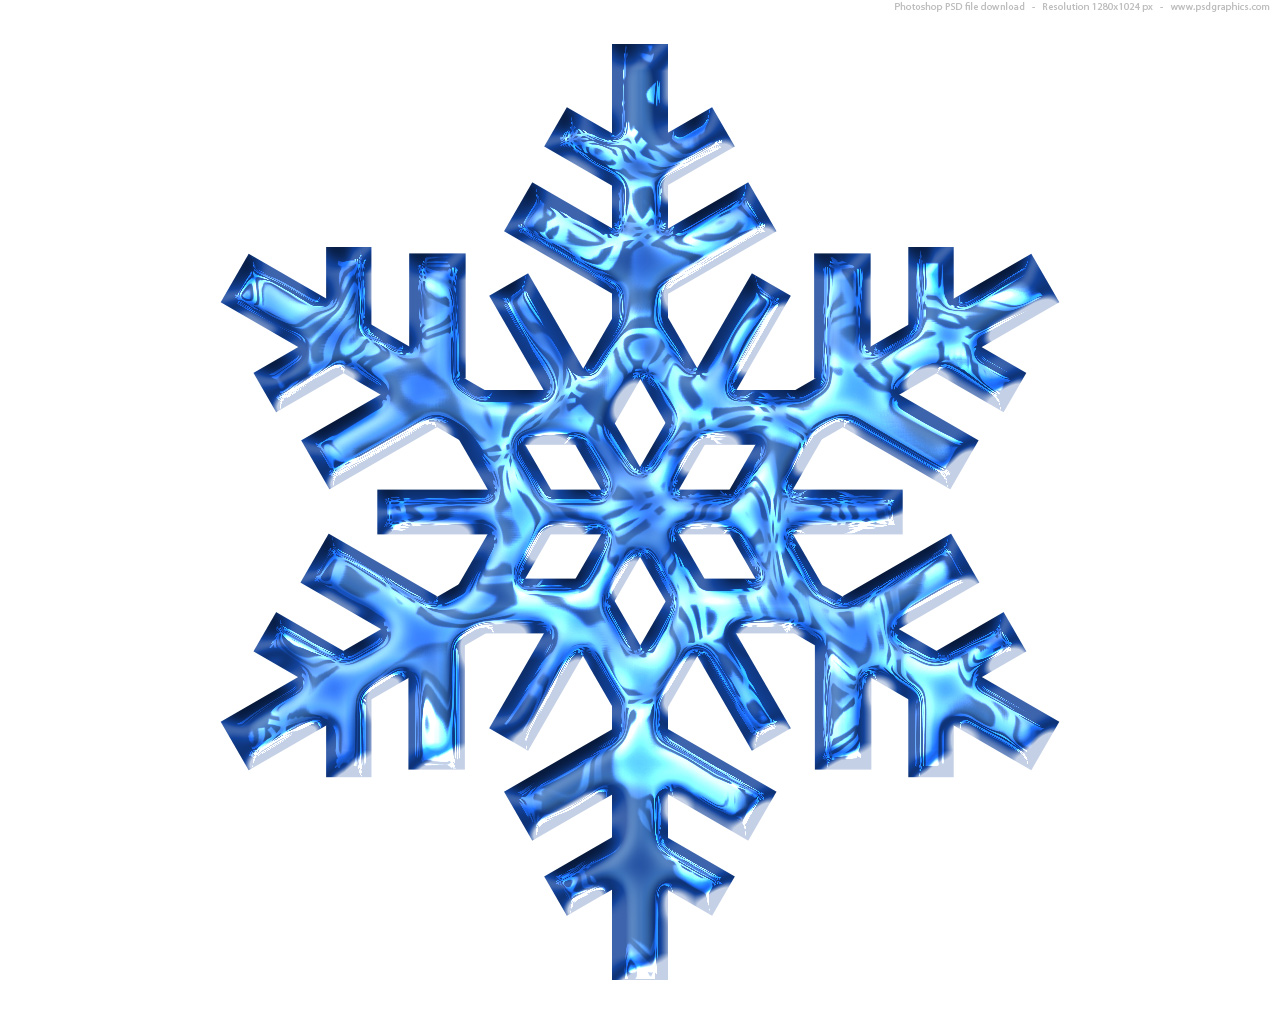 HQ Snowflake Wallpapers | File 325.82Kb